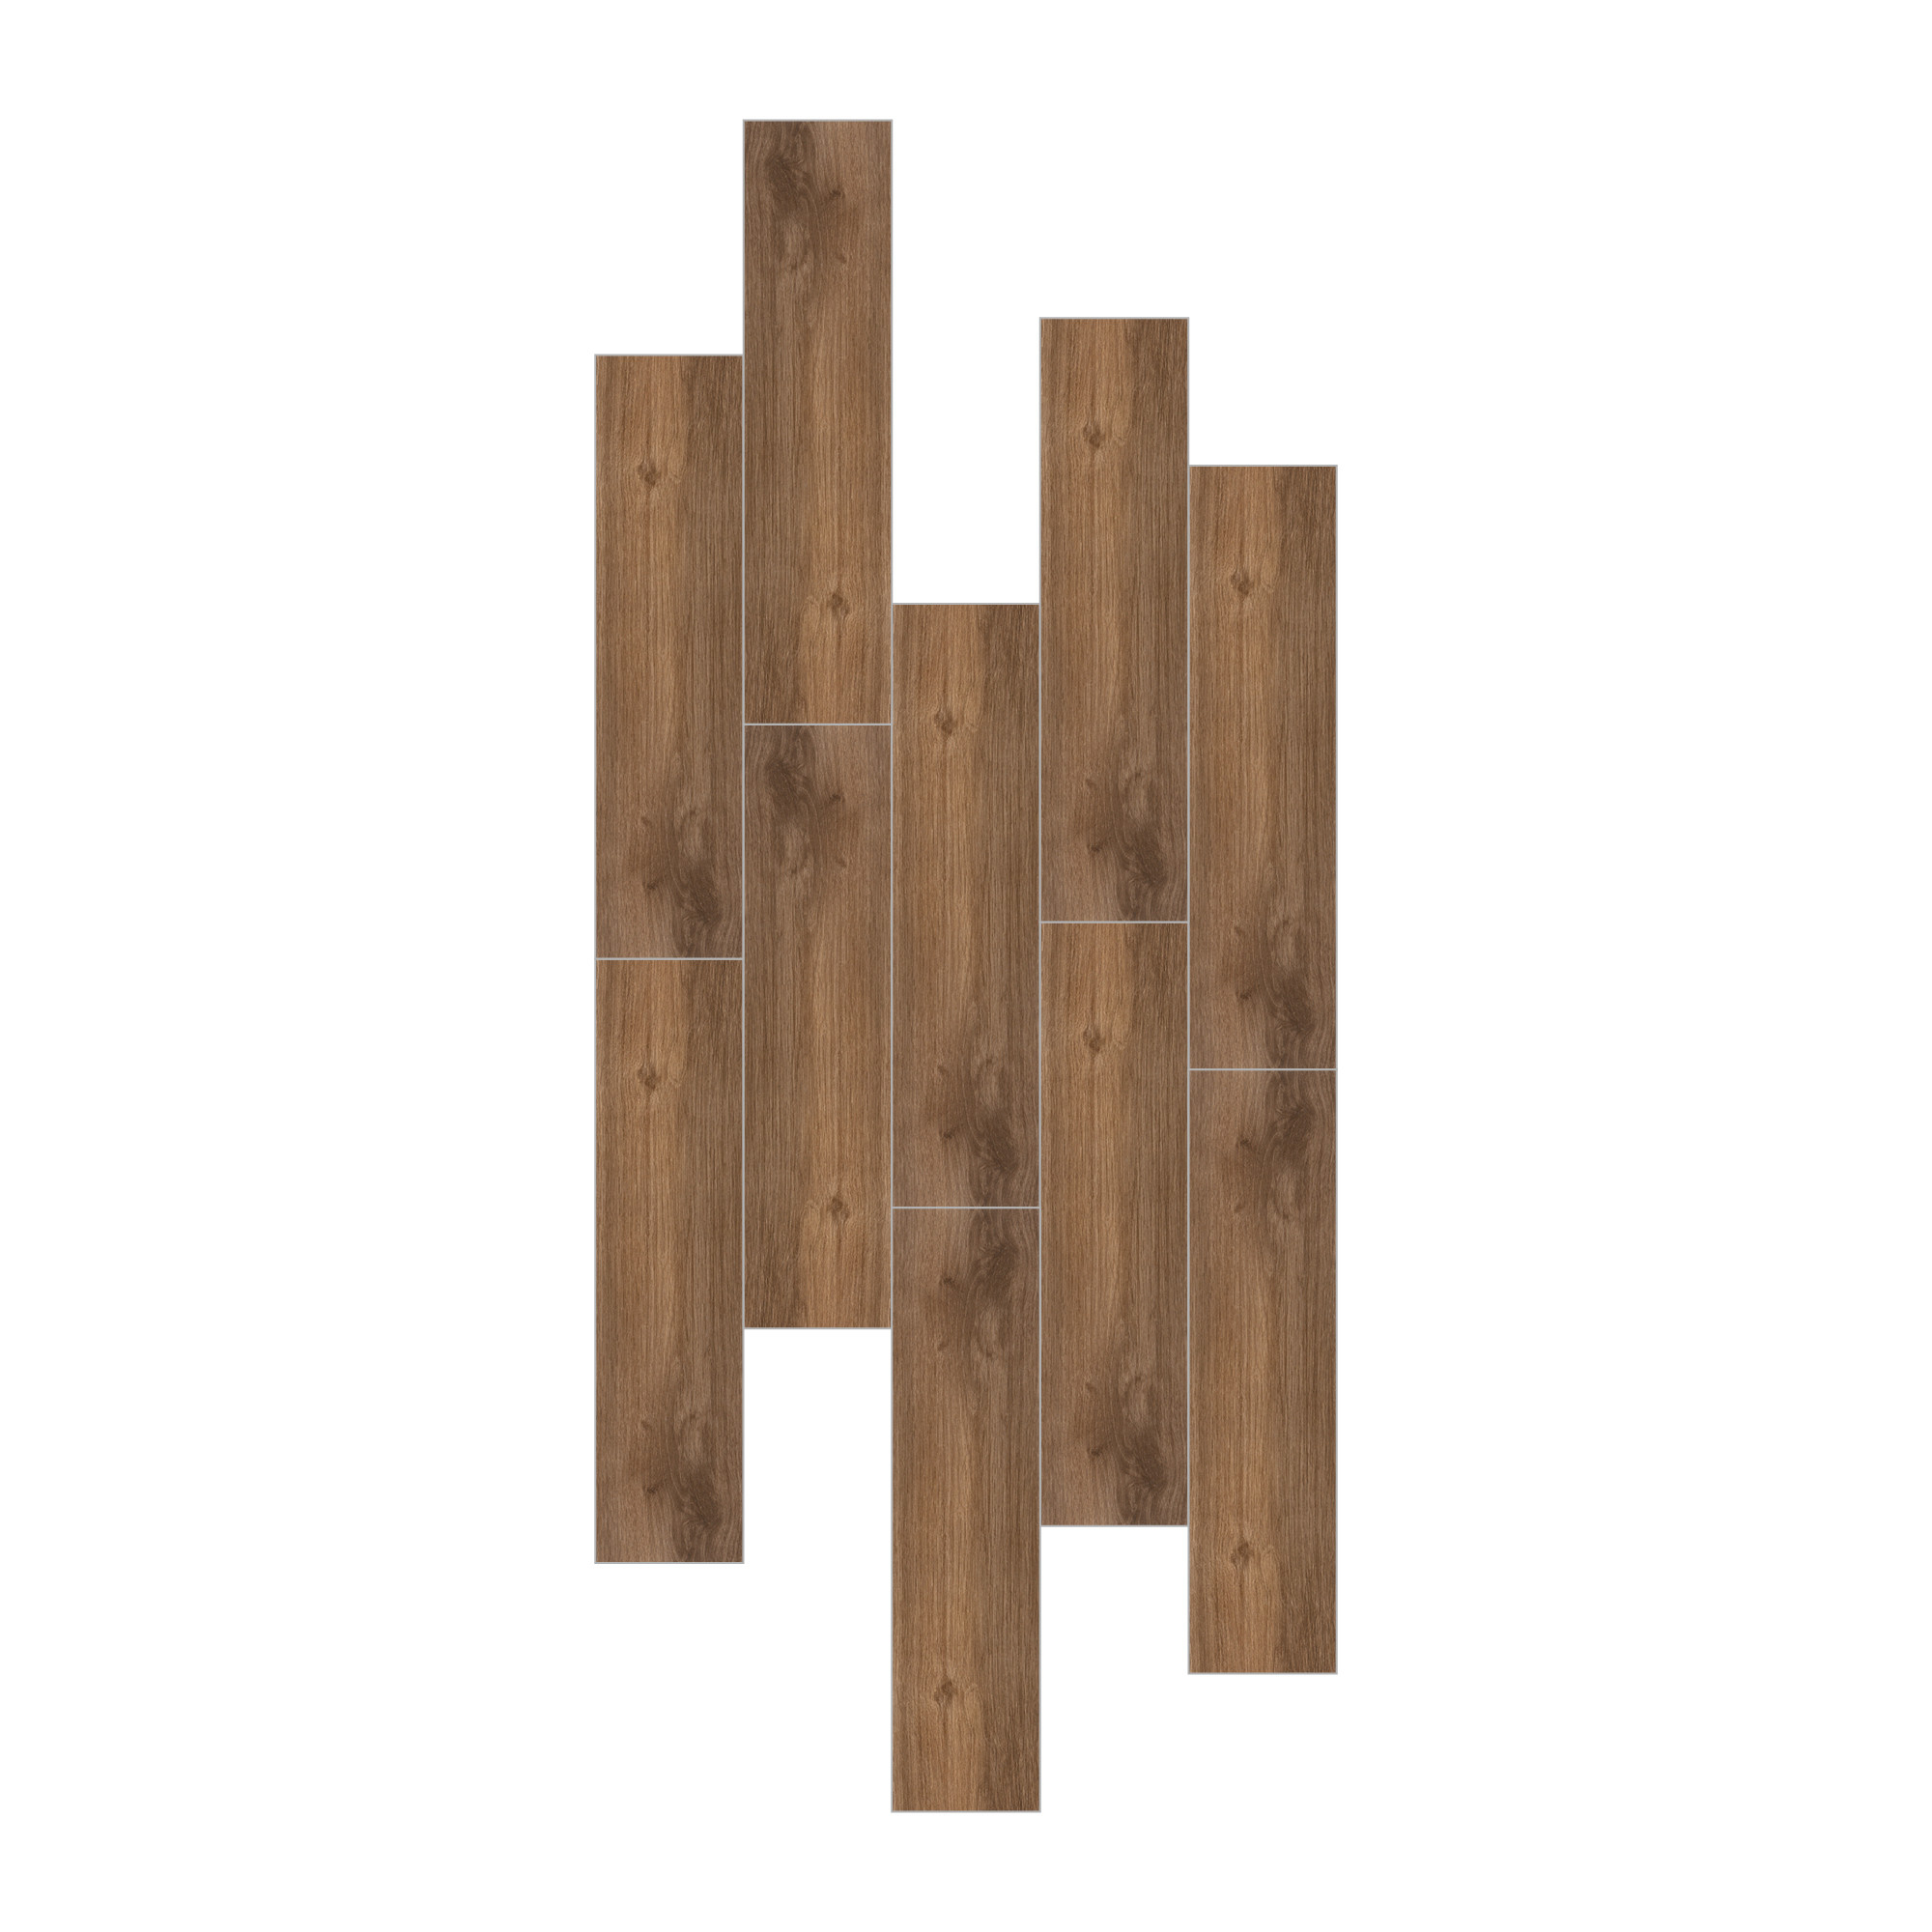 Carrelage sol et mur aspect parquet chocolat Walkyria Fresno 20x120 cm